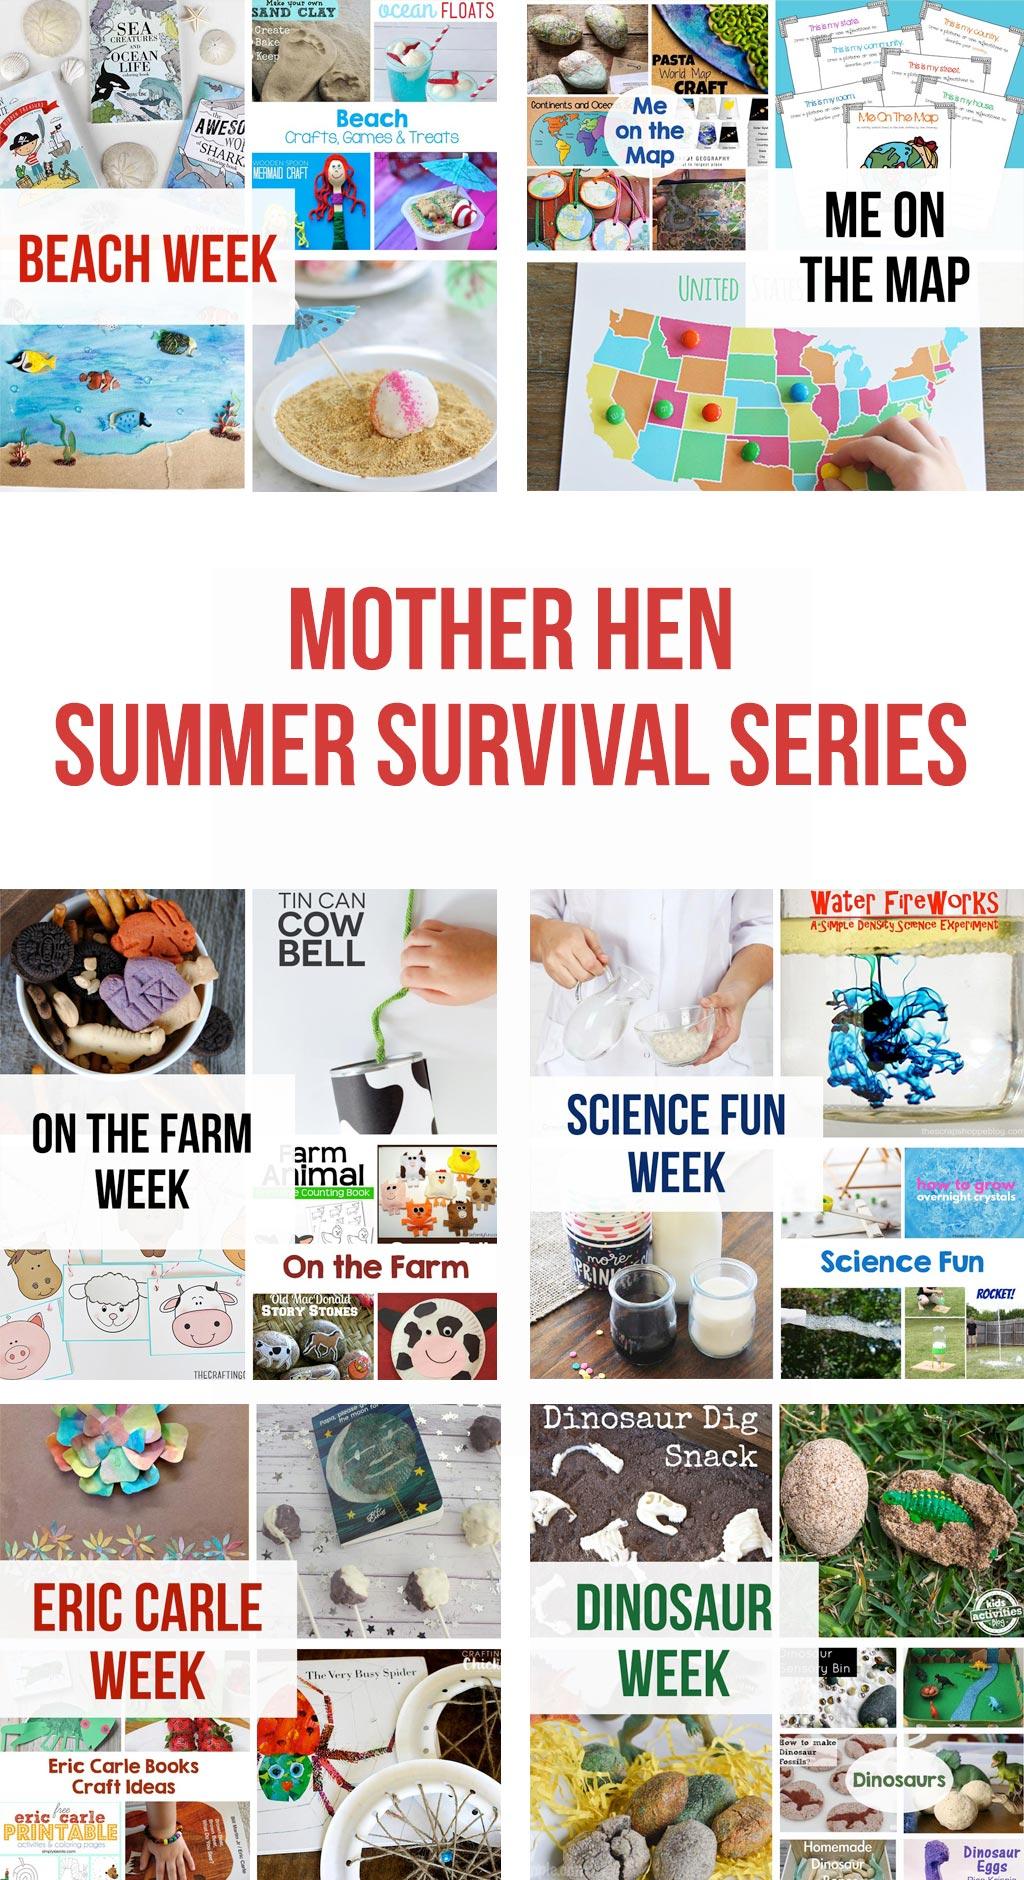 mother hen summer survival series